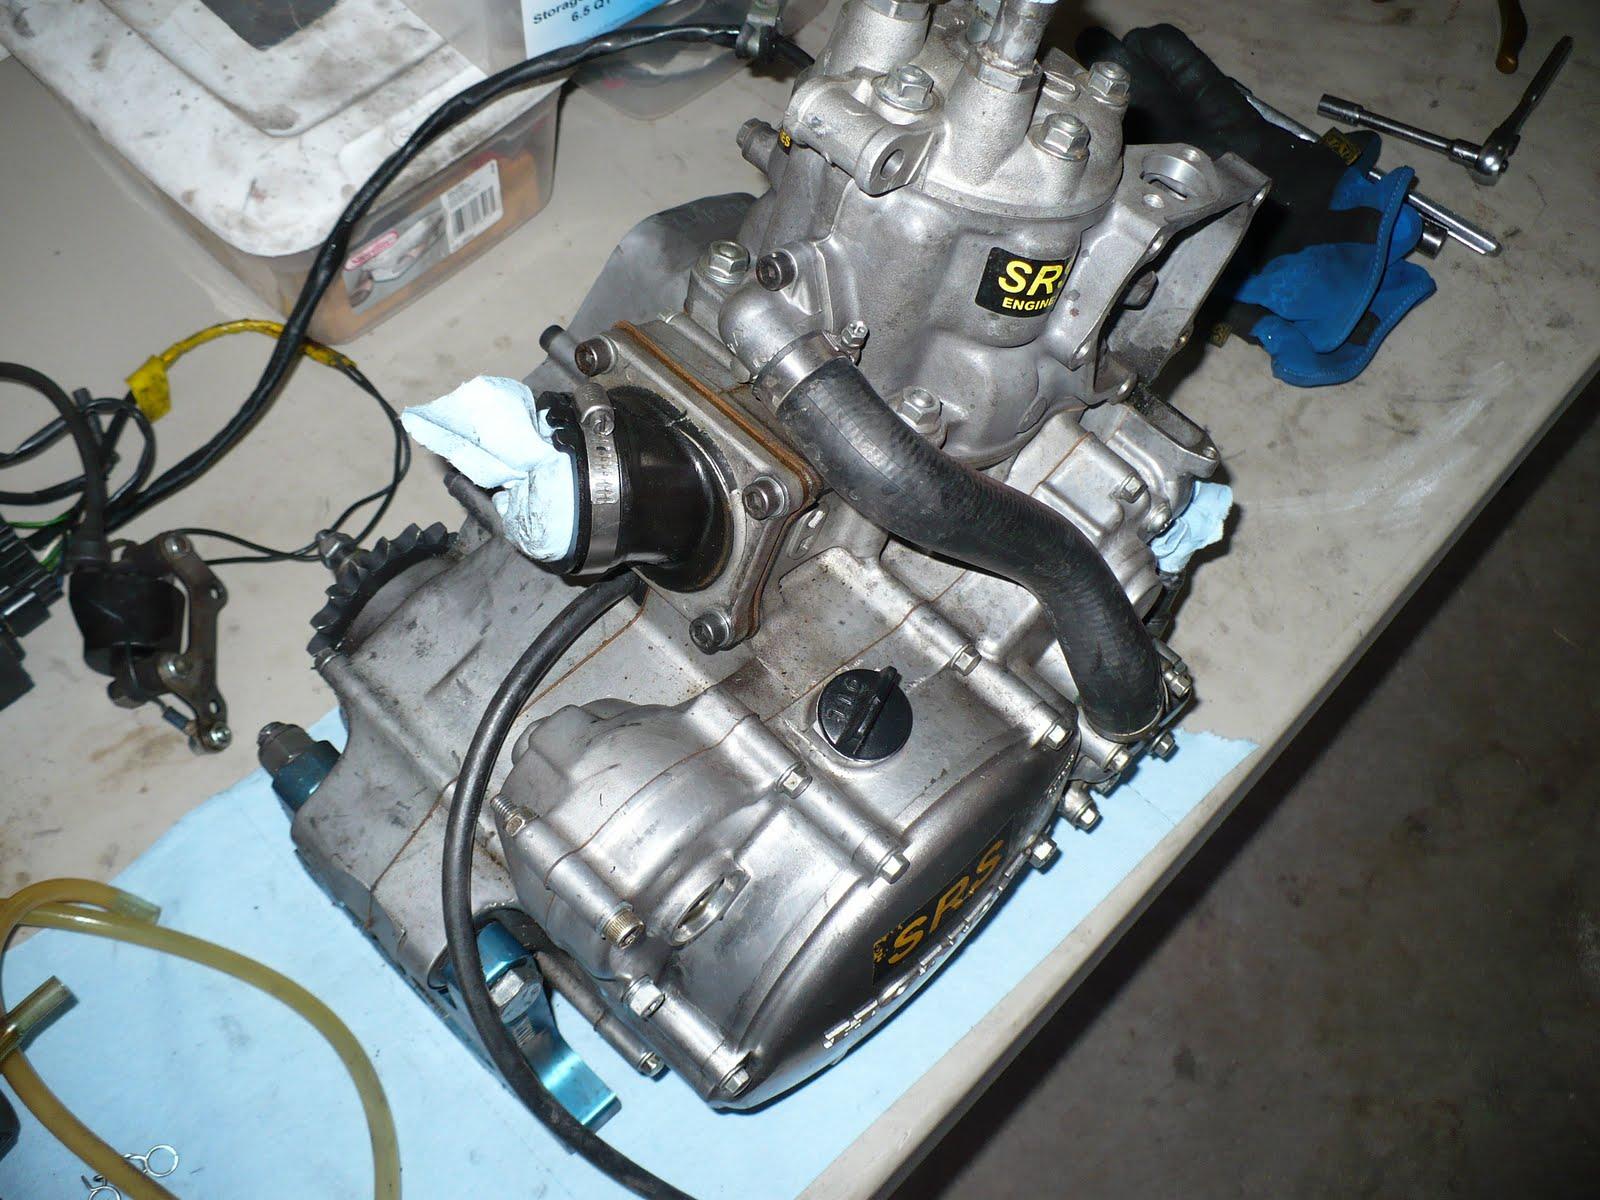 YAW MOMENT RACING: Off-season Refresh for my Honda CR125